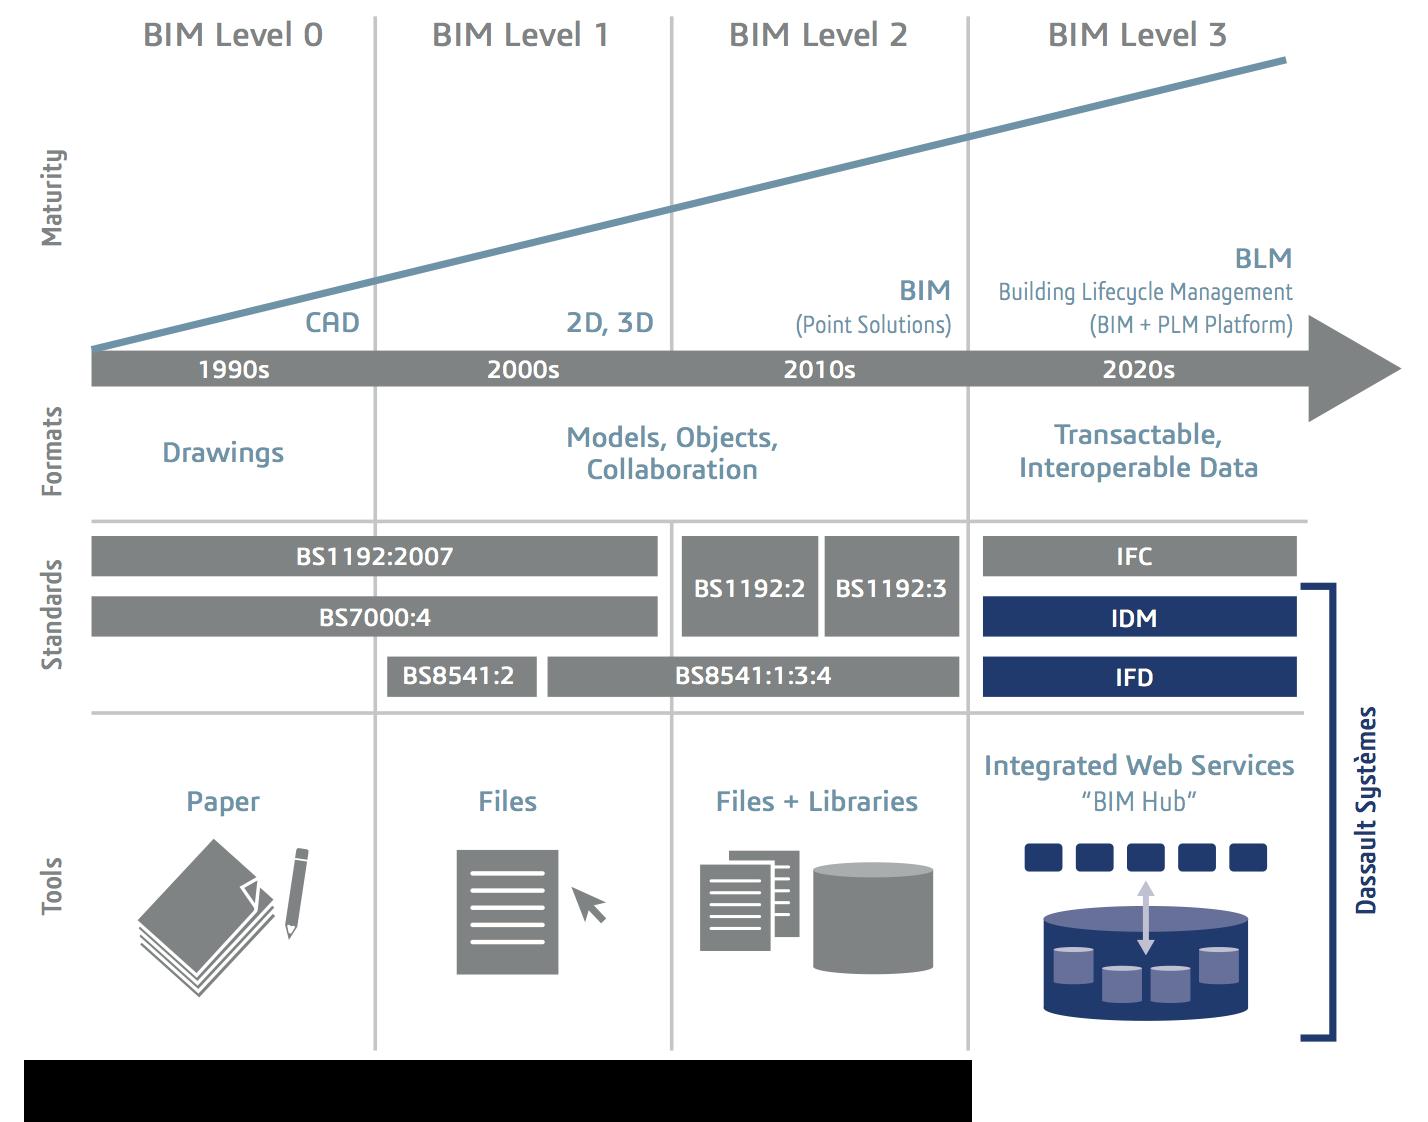 The BIM maturity model by Mark Bew and Mervyn Richards